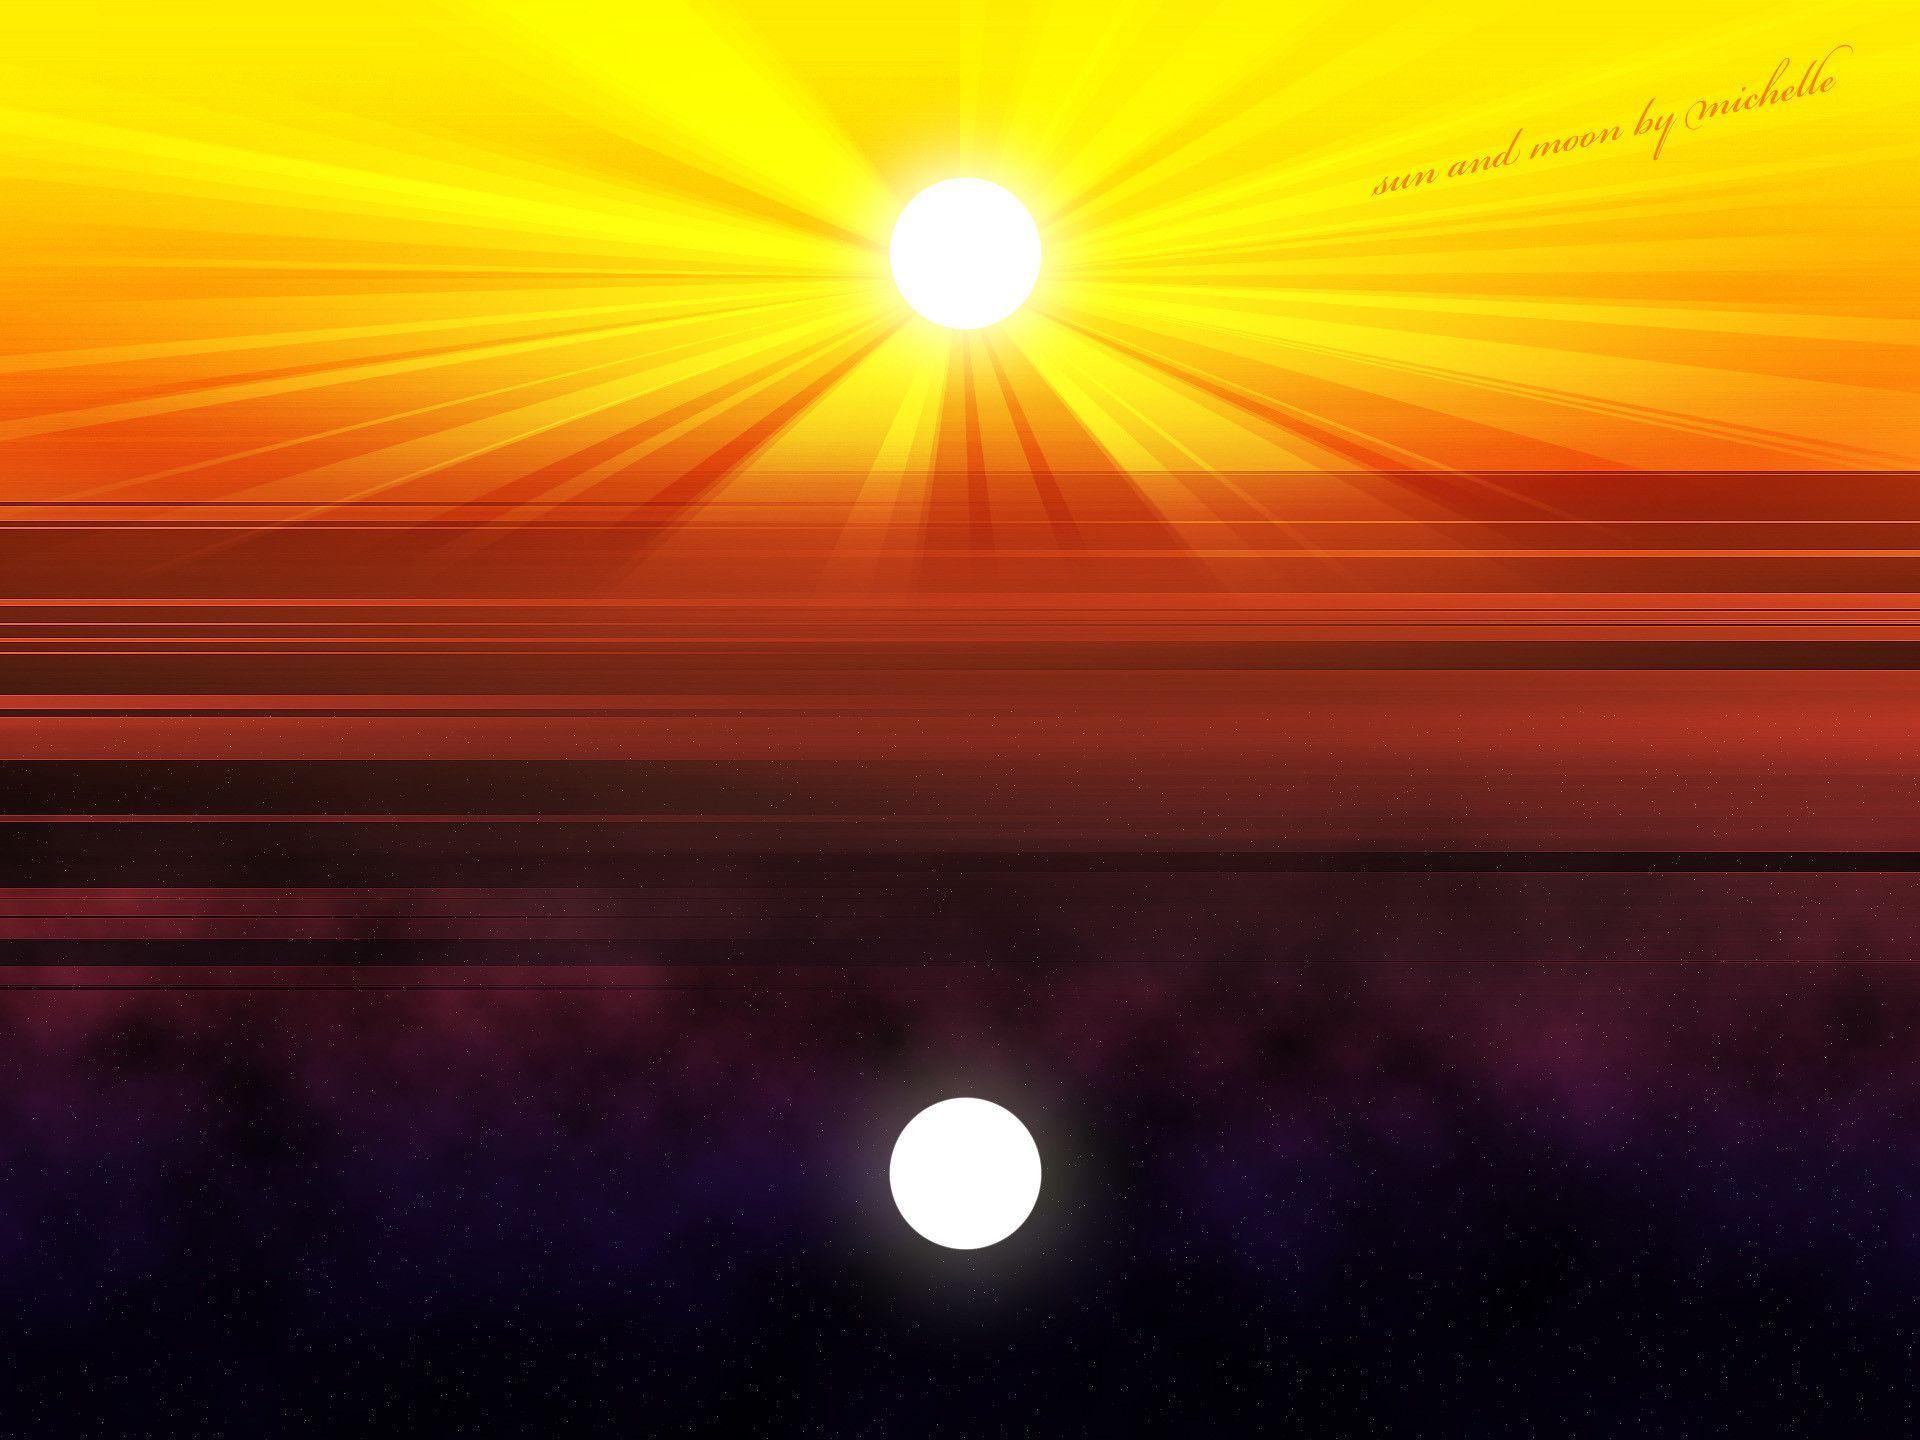 star background sun moon - photo #47